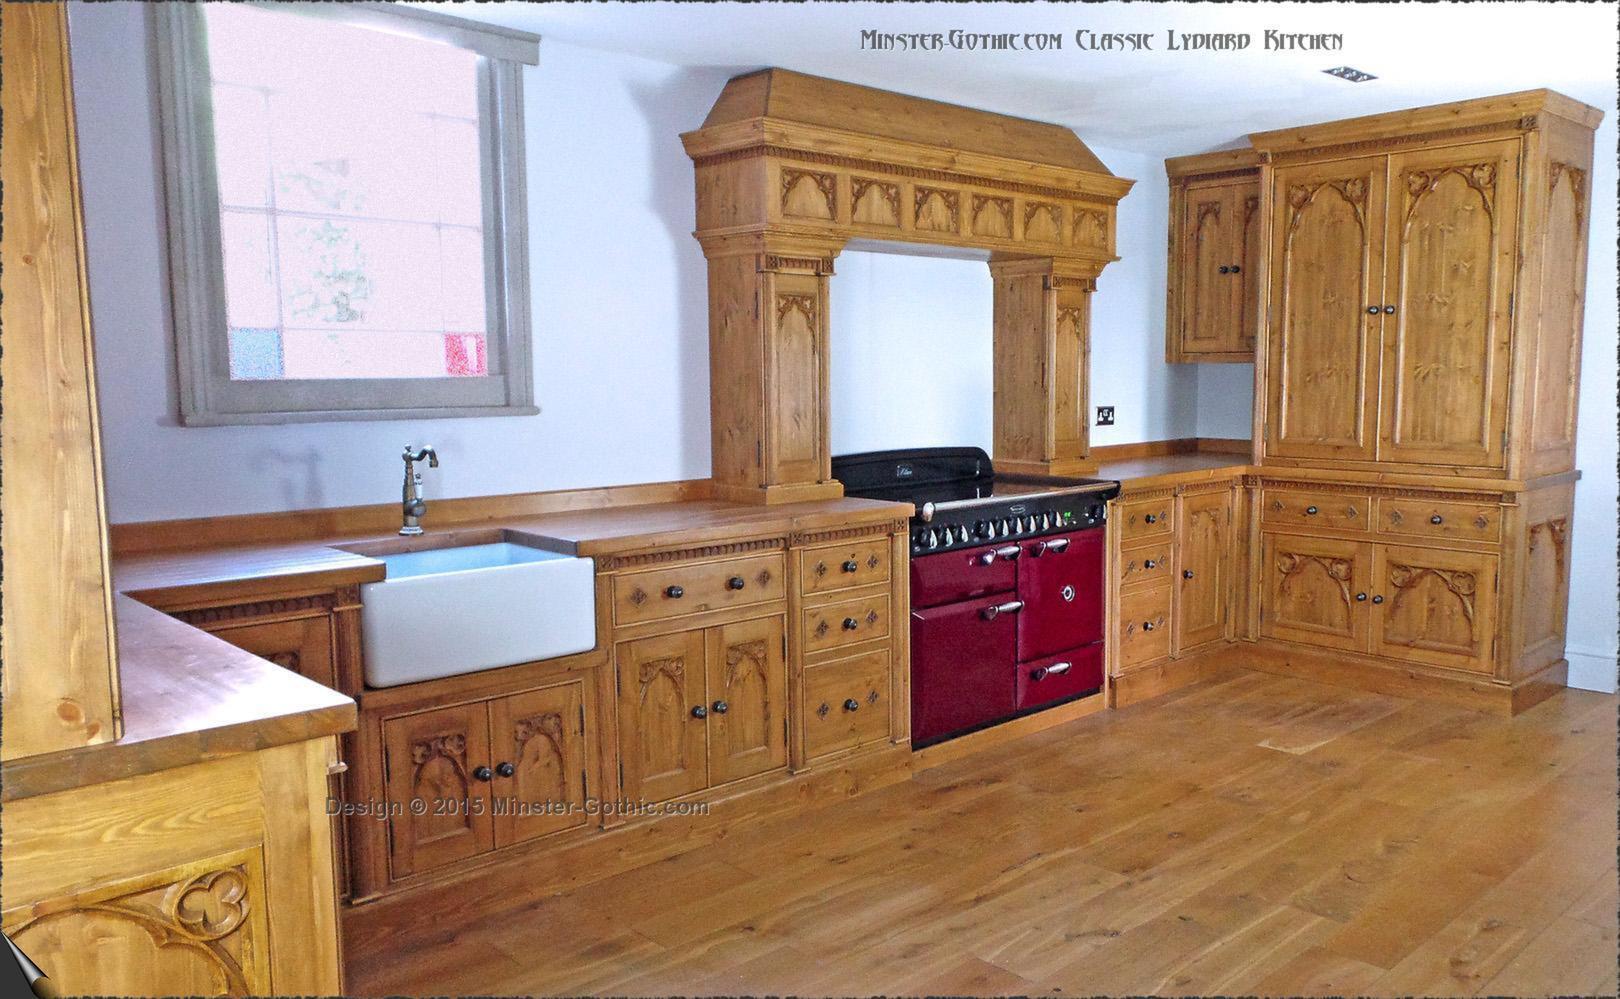 Kitchen Cabinets Ed Gothic Kitchen Cabinets